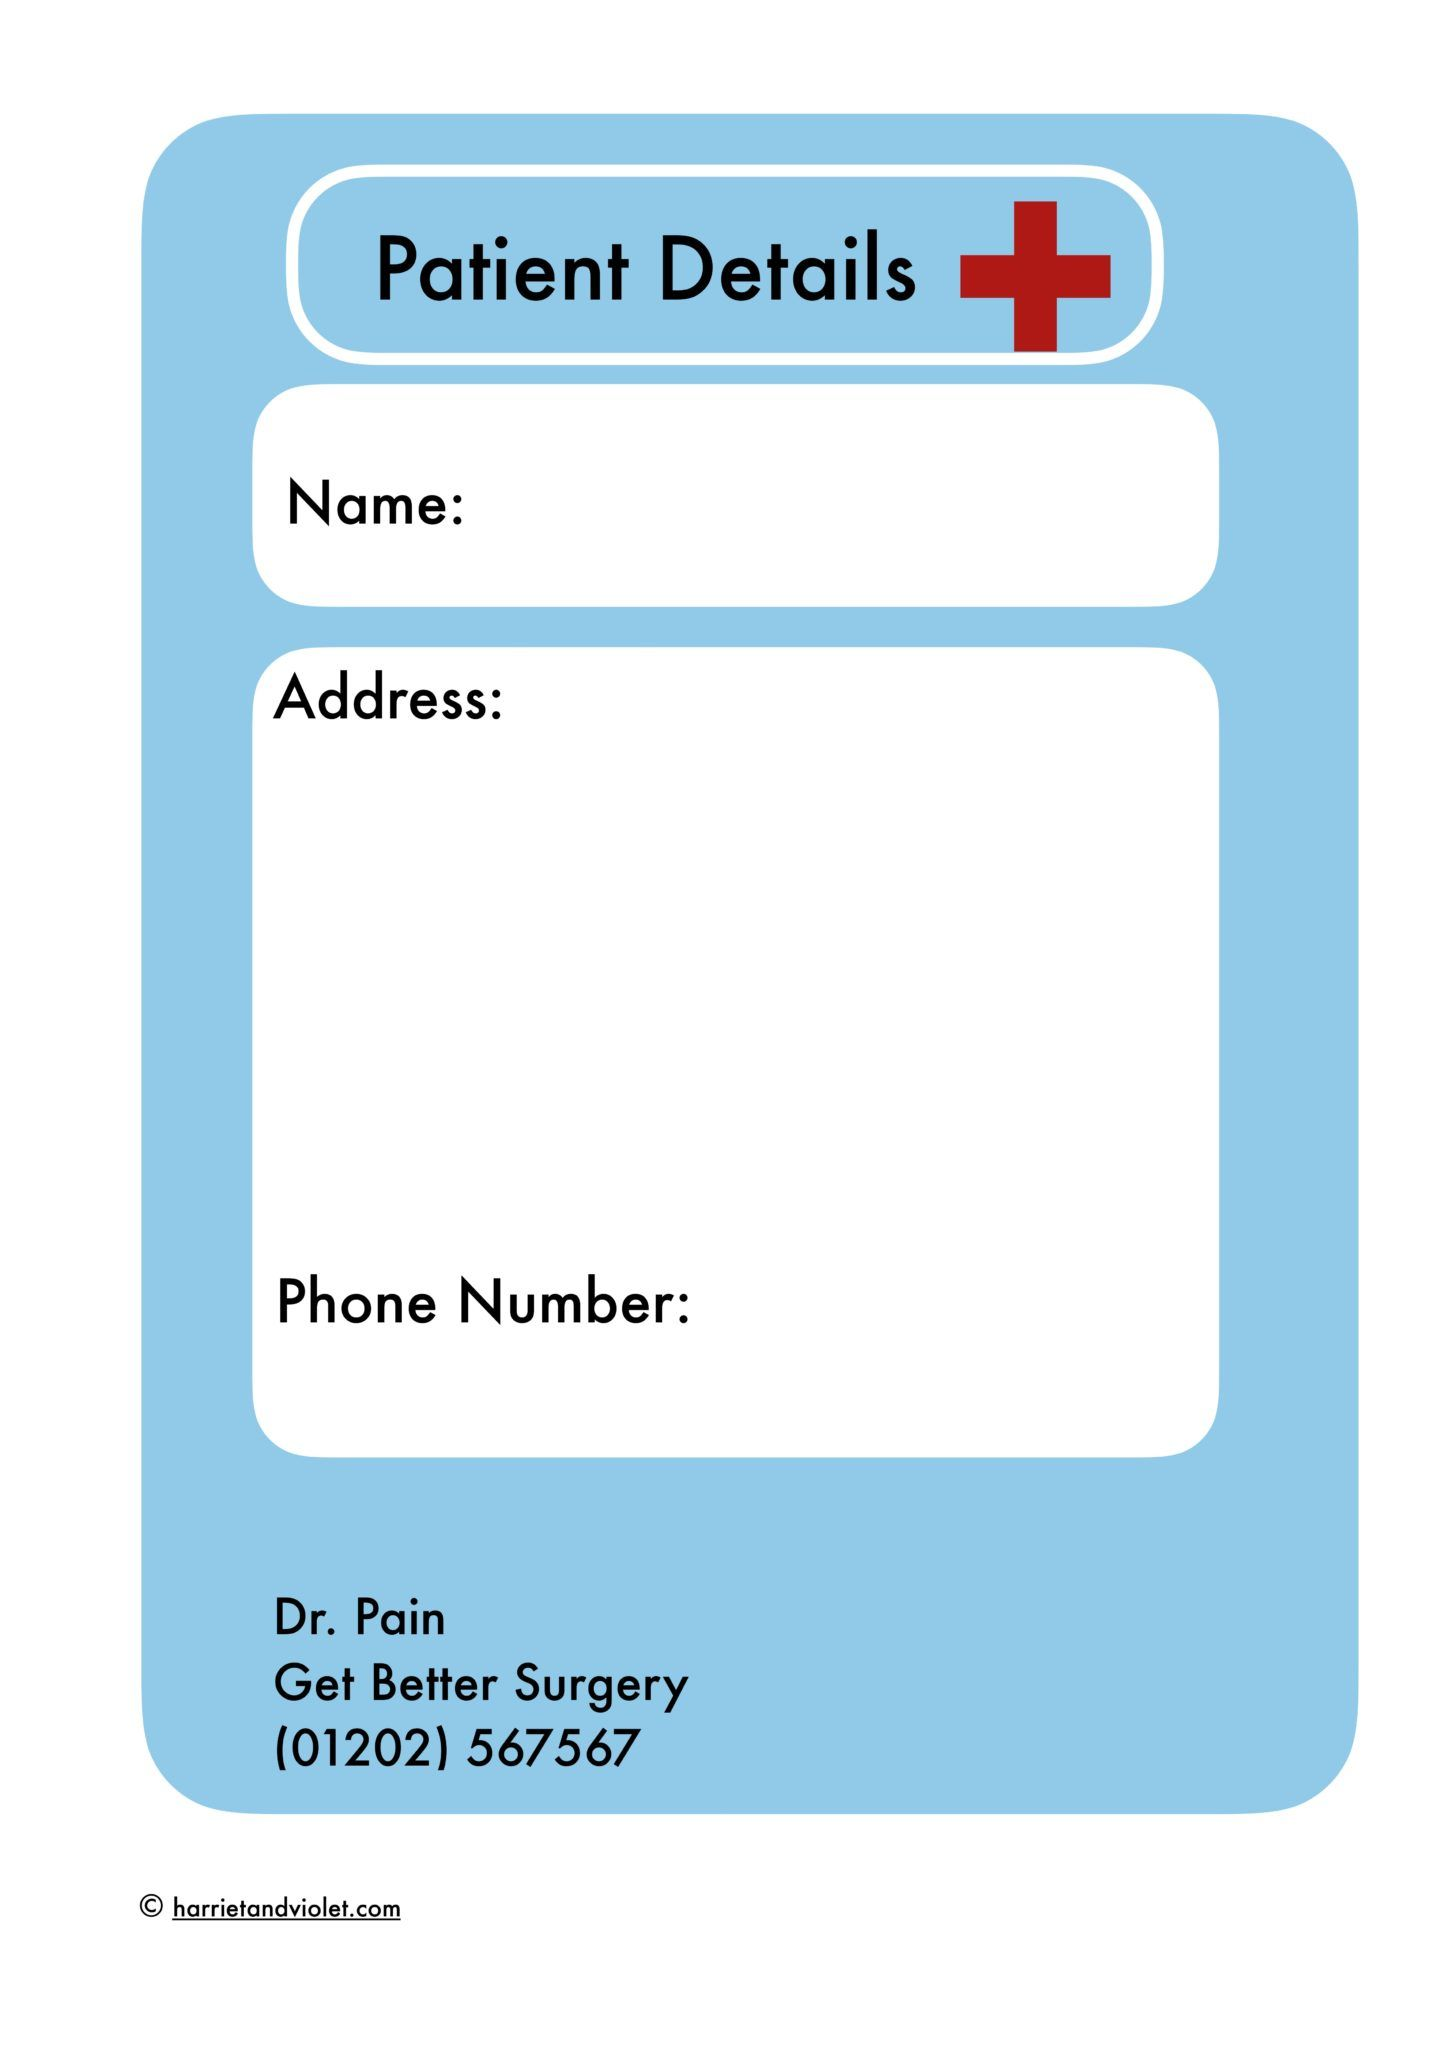 Hospital Form Patient Details To Set Up A Hospital Or